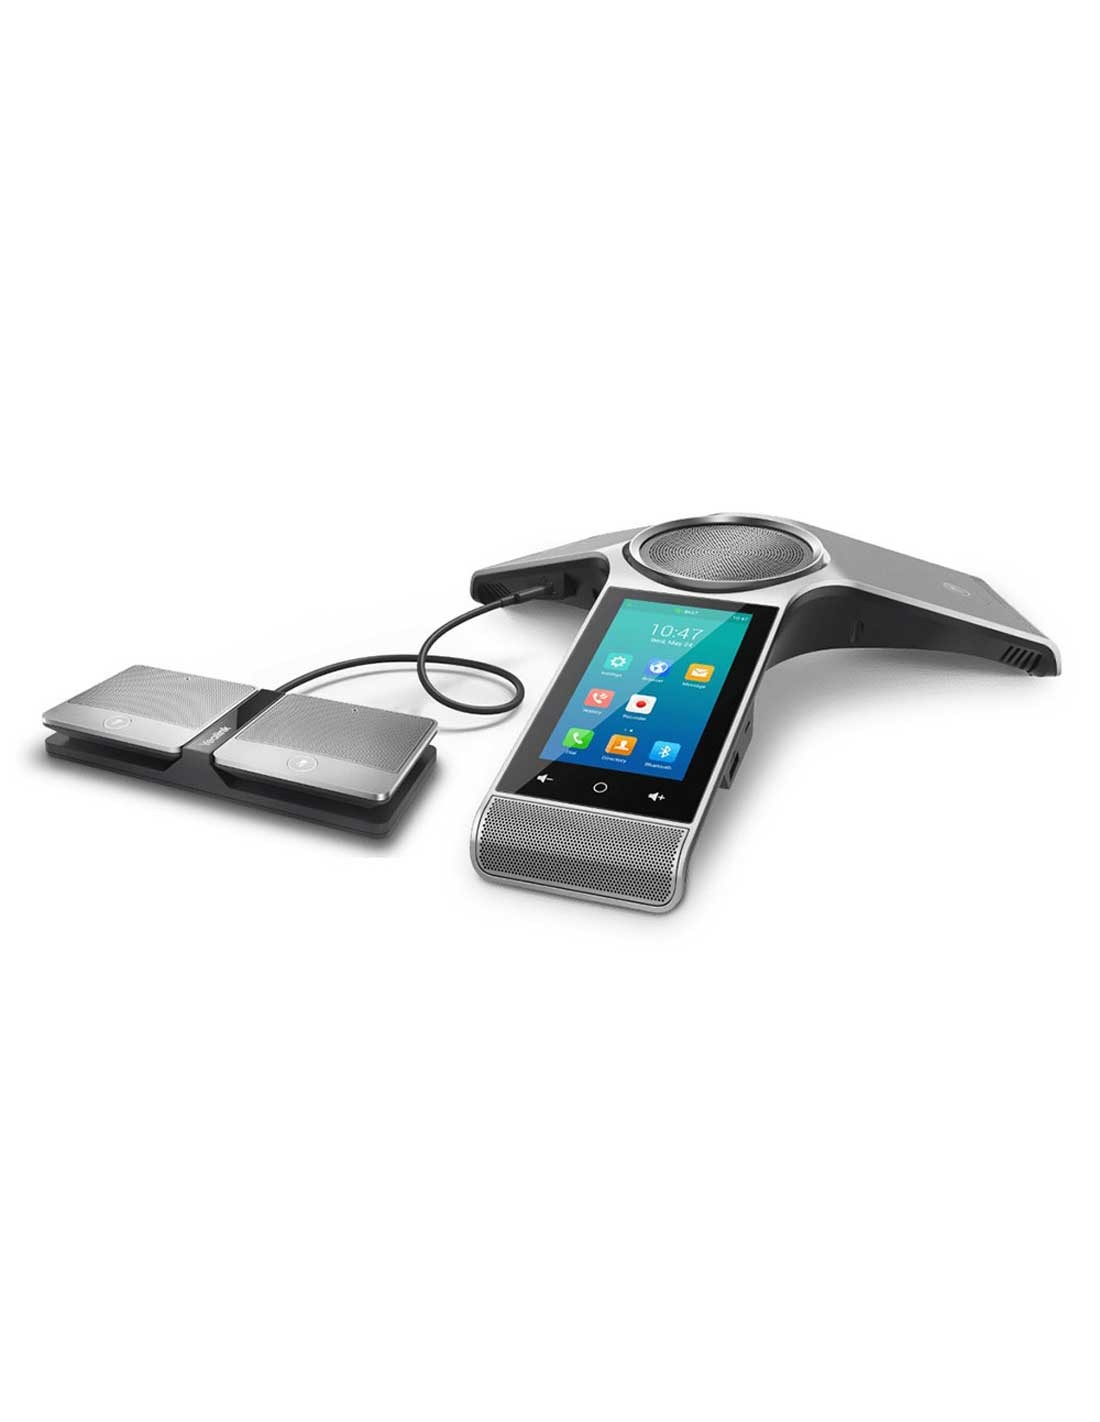 Yealink CP960-WirelessMic IP Phone Images